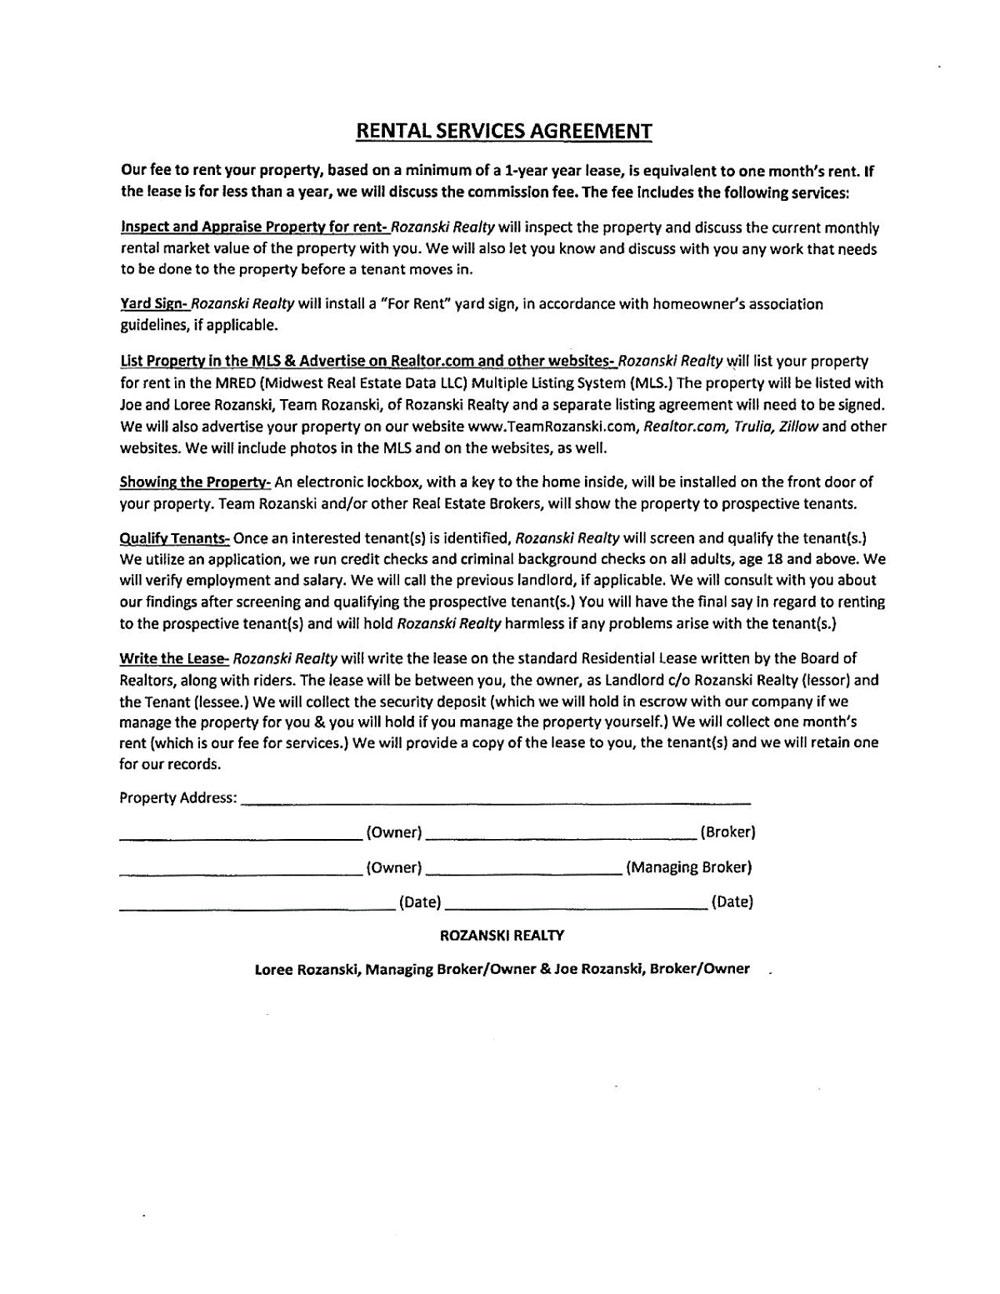 Rental Services Agreement